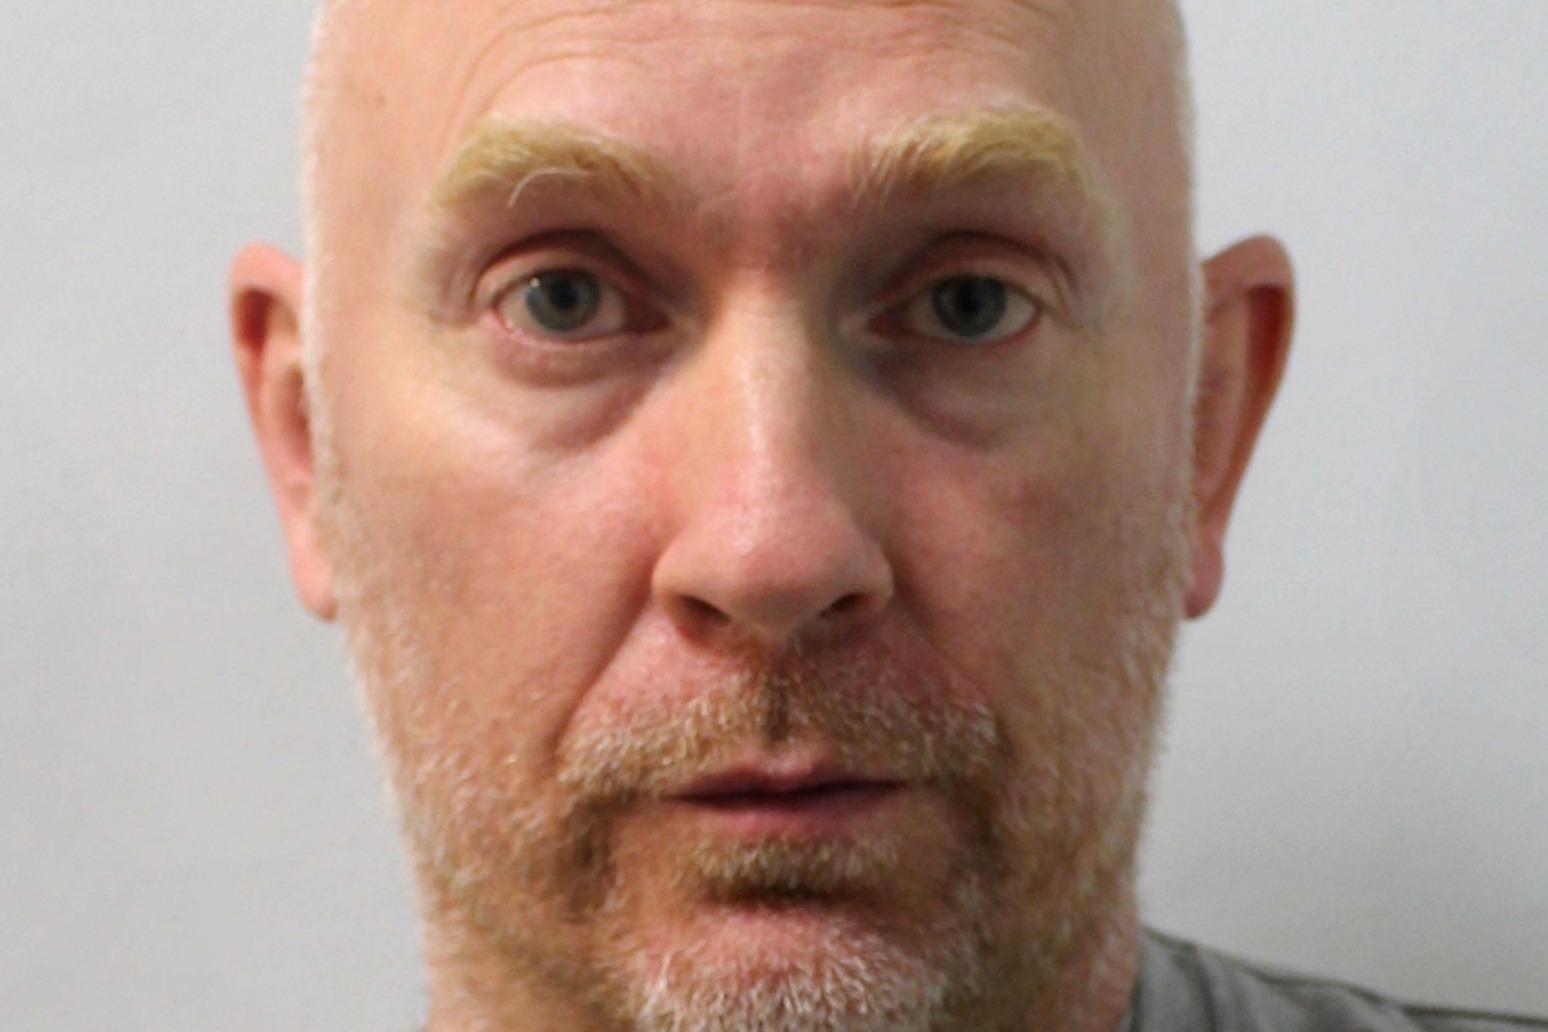 Sarah Everard's killer was deployed to Parliamentary Estate